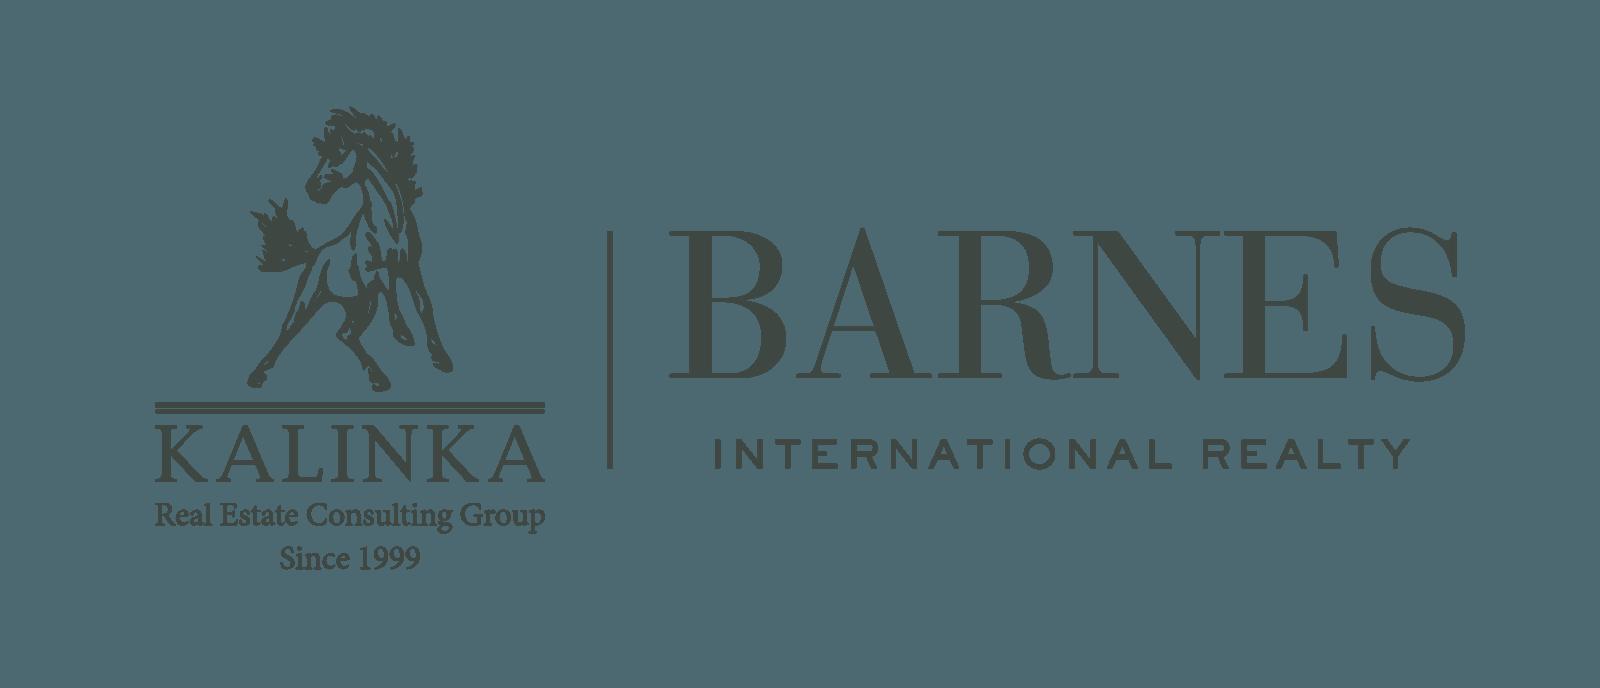 Kalinka barnes a real estate partnership in russia